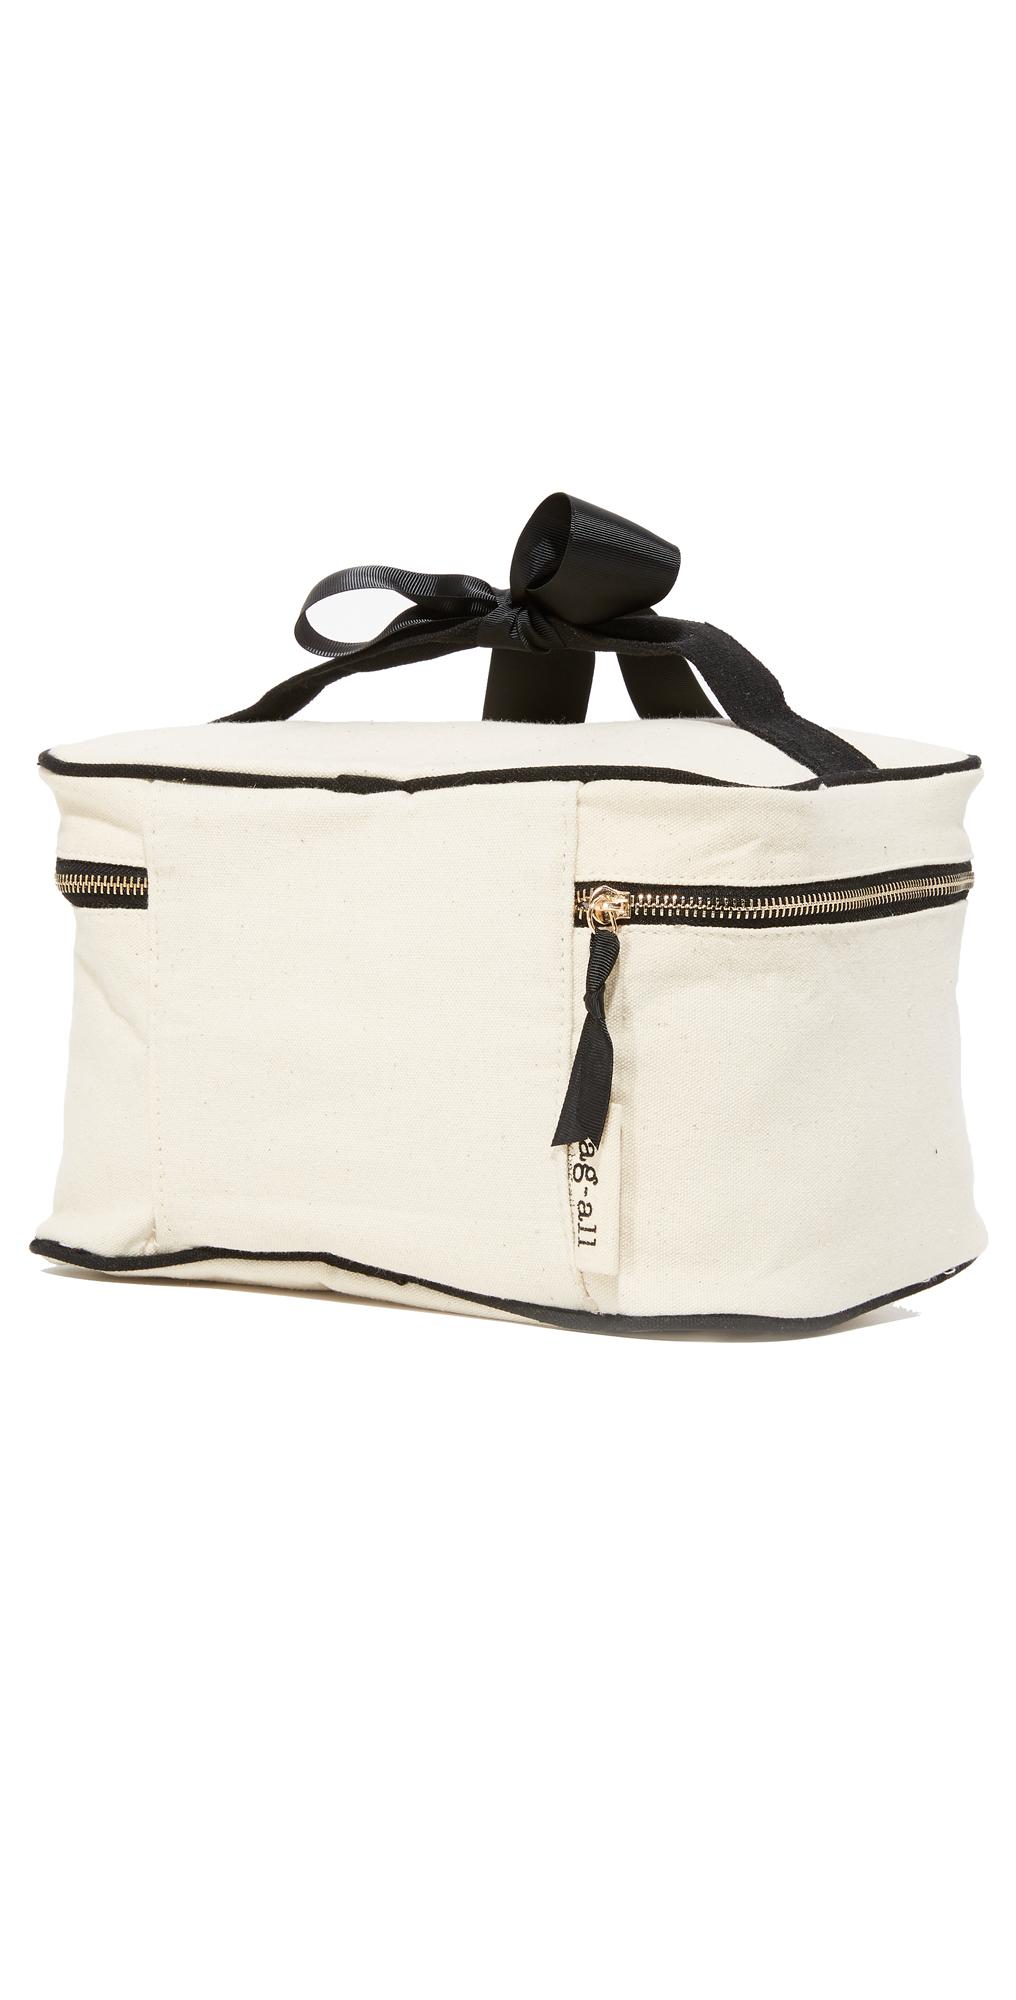 Bag-all My Vanity Travel Case